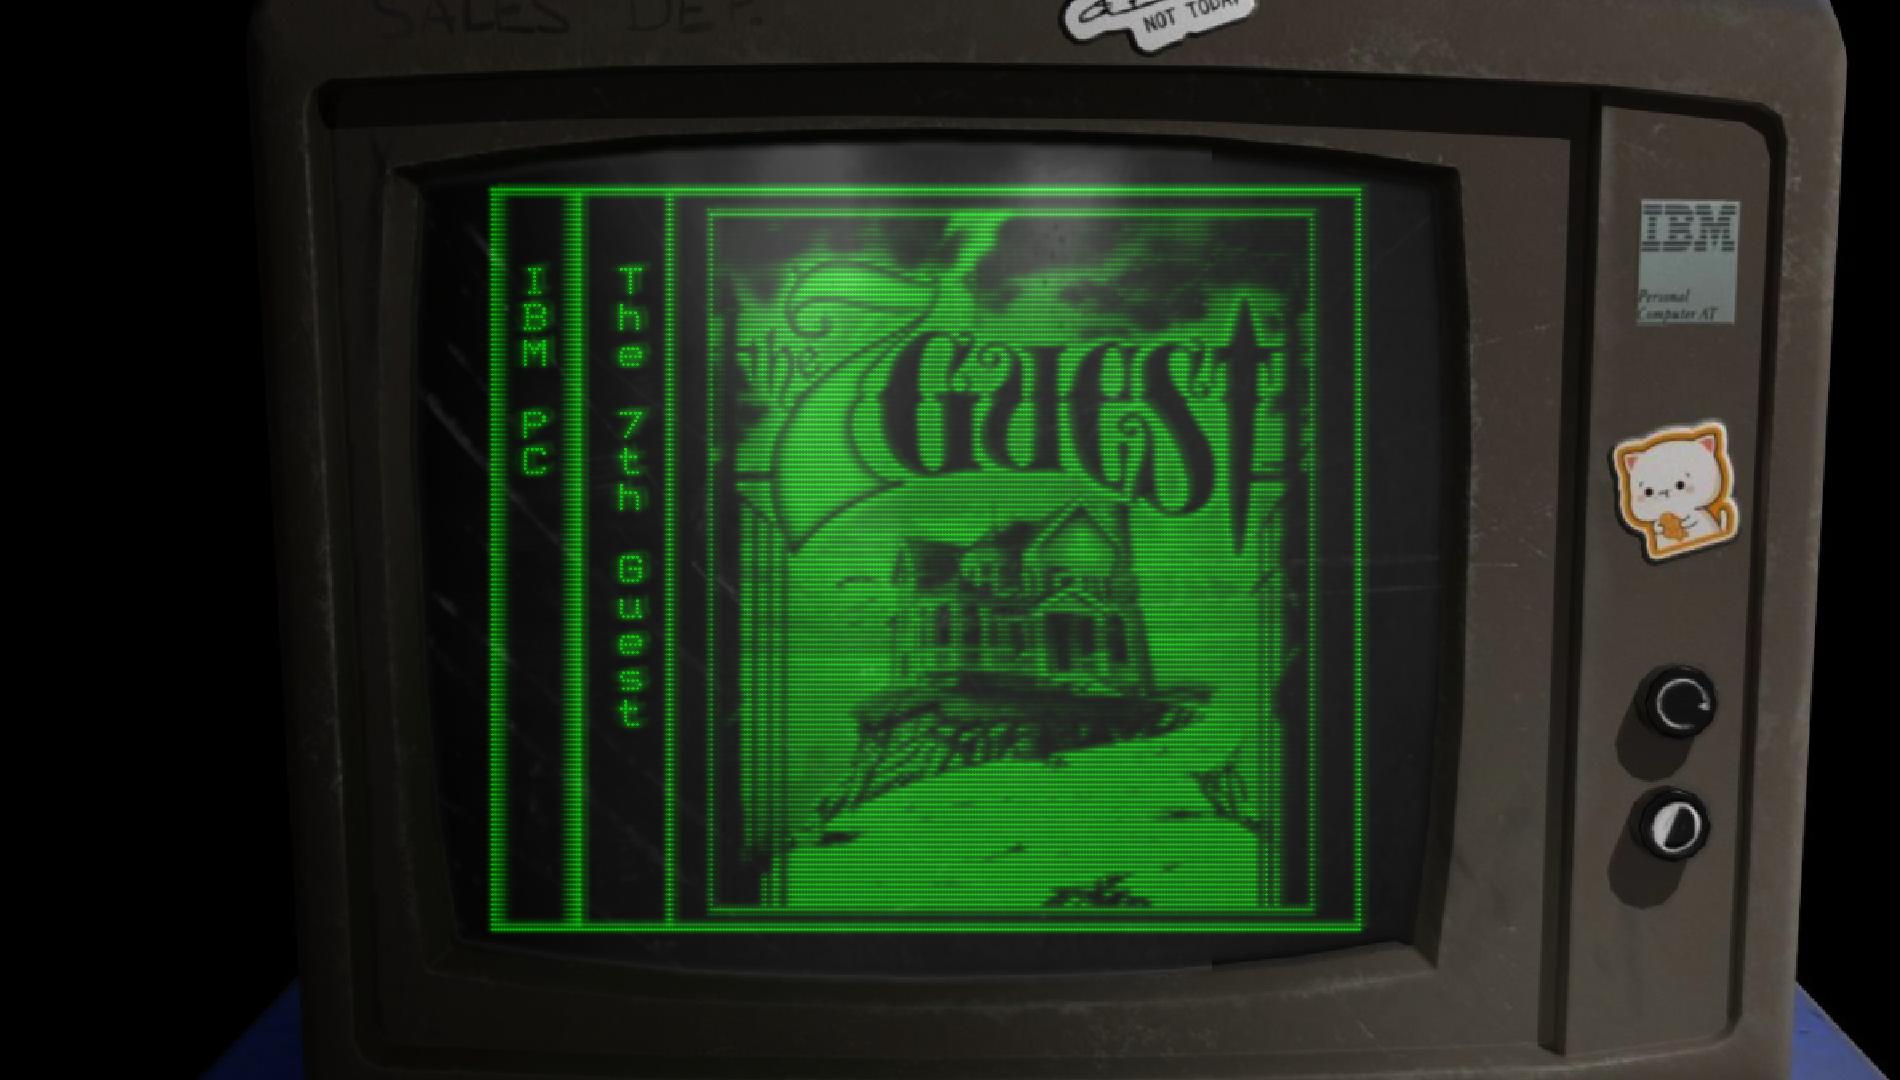 Big Green CRT (Registration)